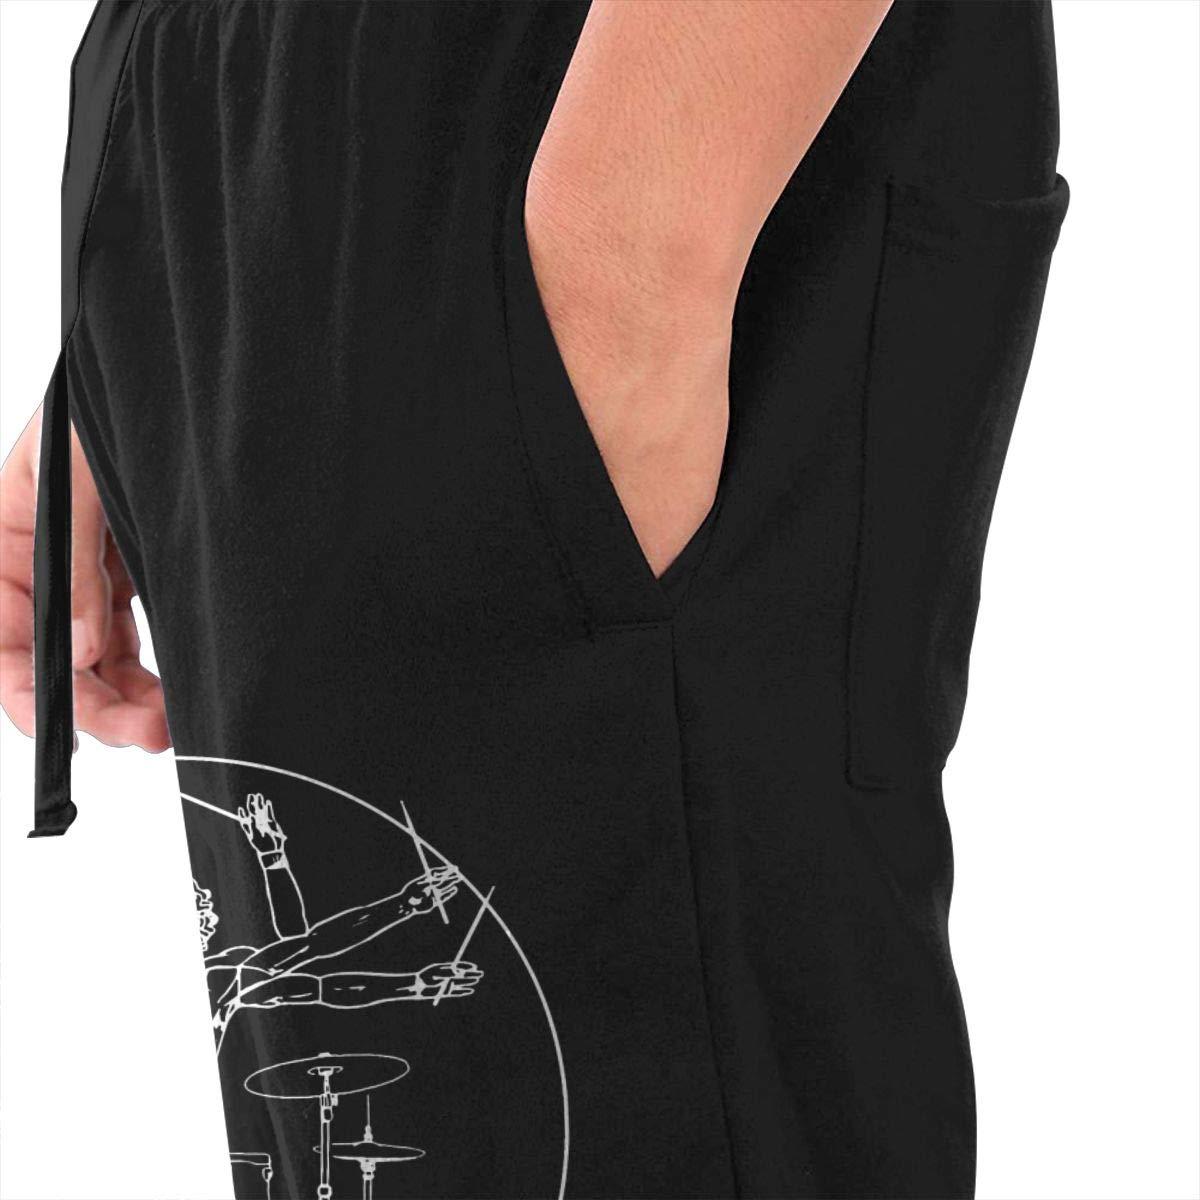 Da Vinci Drums Drawstring Waist,100/% Cotton,Elastic Waist Cuffed,Jogger Sweatpants Black